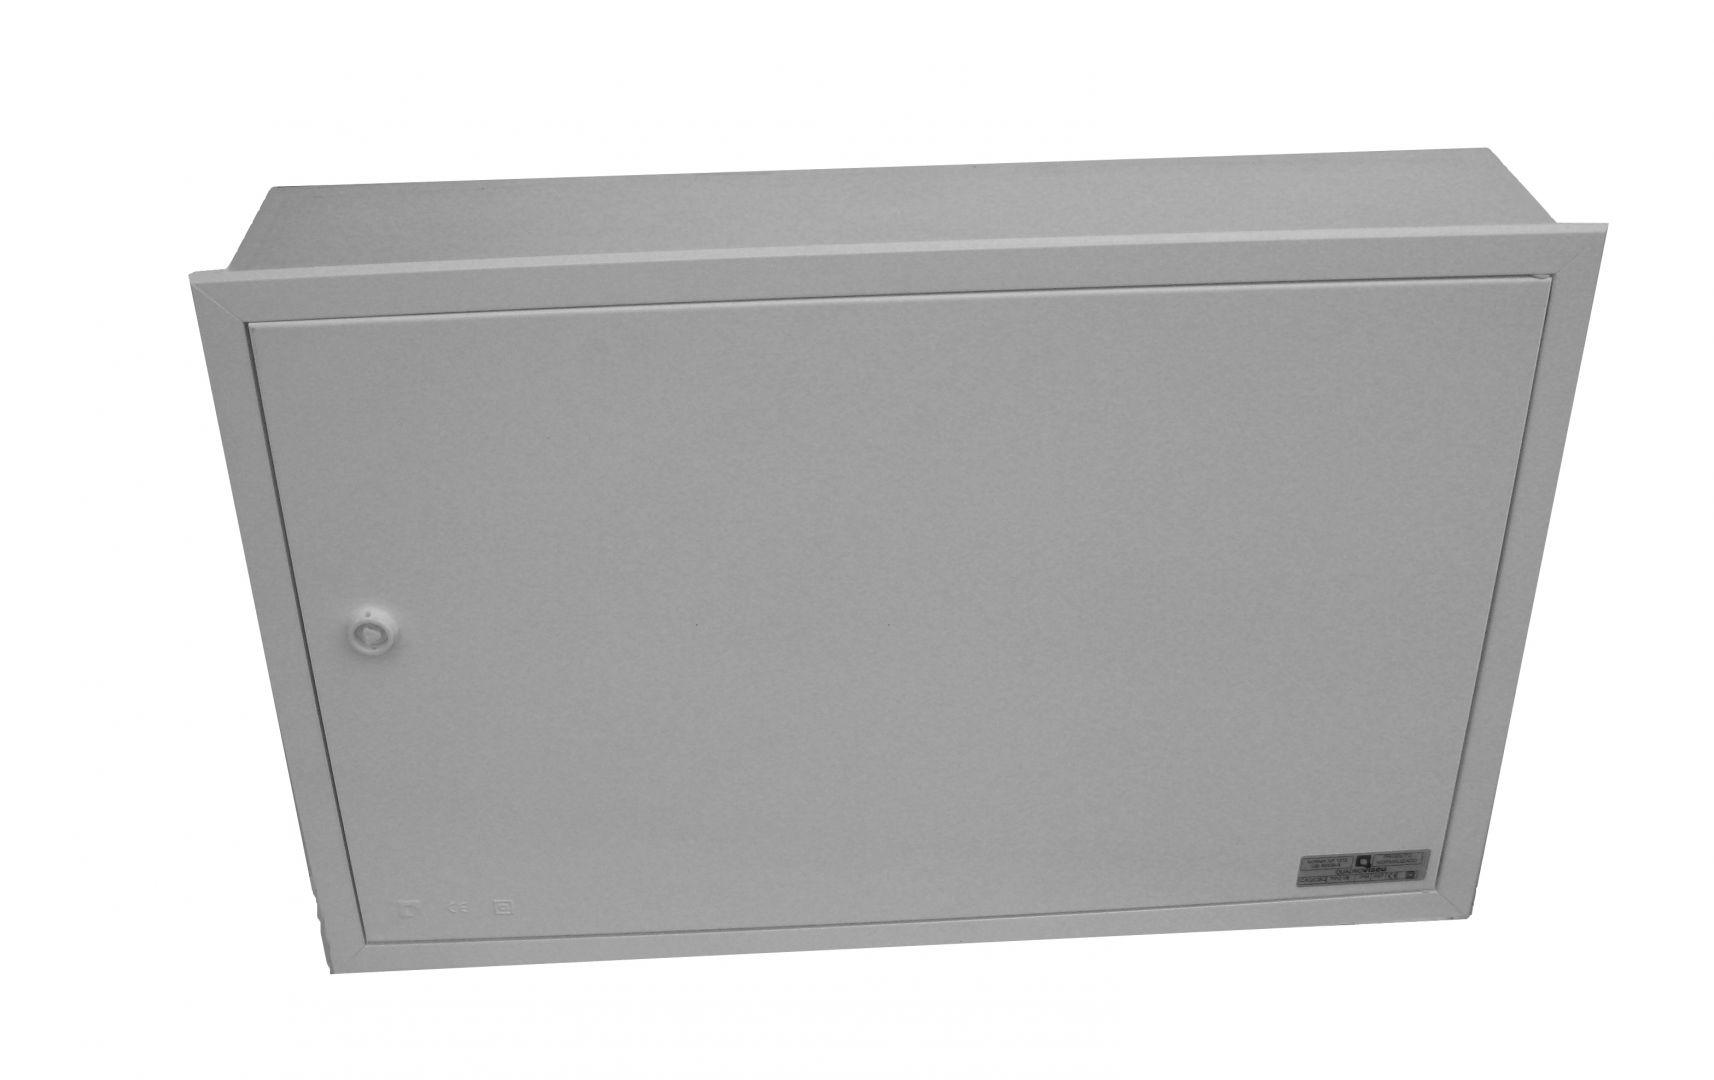 ENVELOPE VISBOX VIDE A ENCASTRER AVEC PORTE 620X400X130